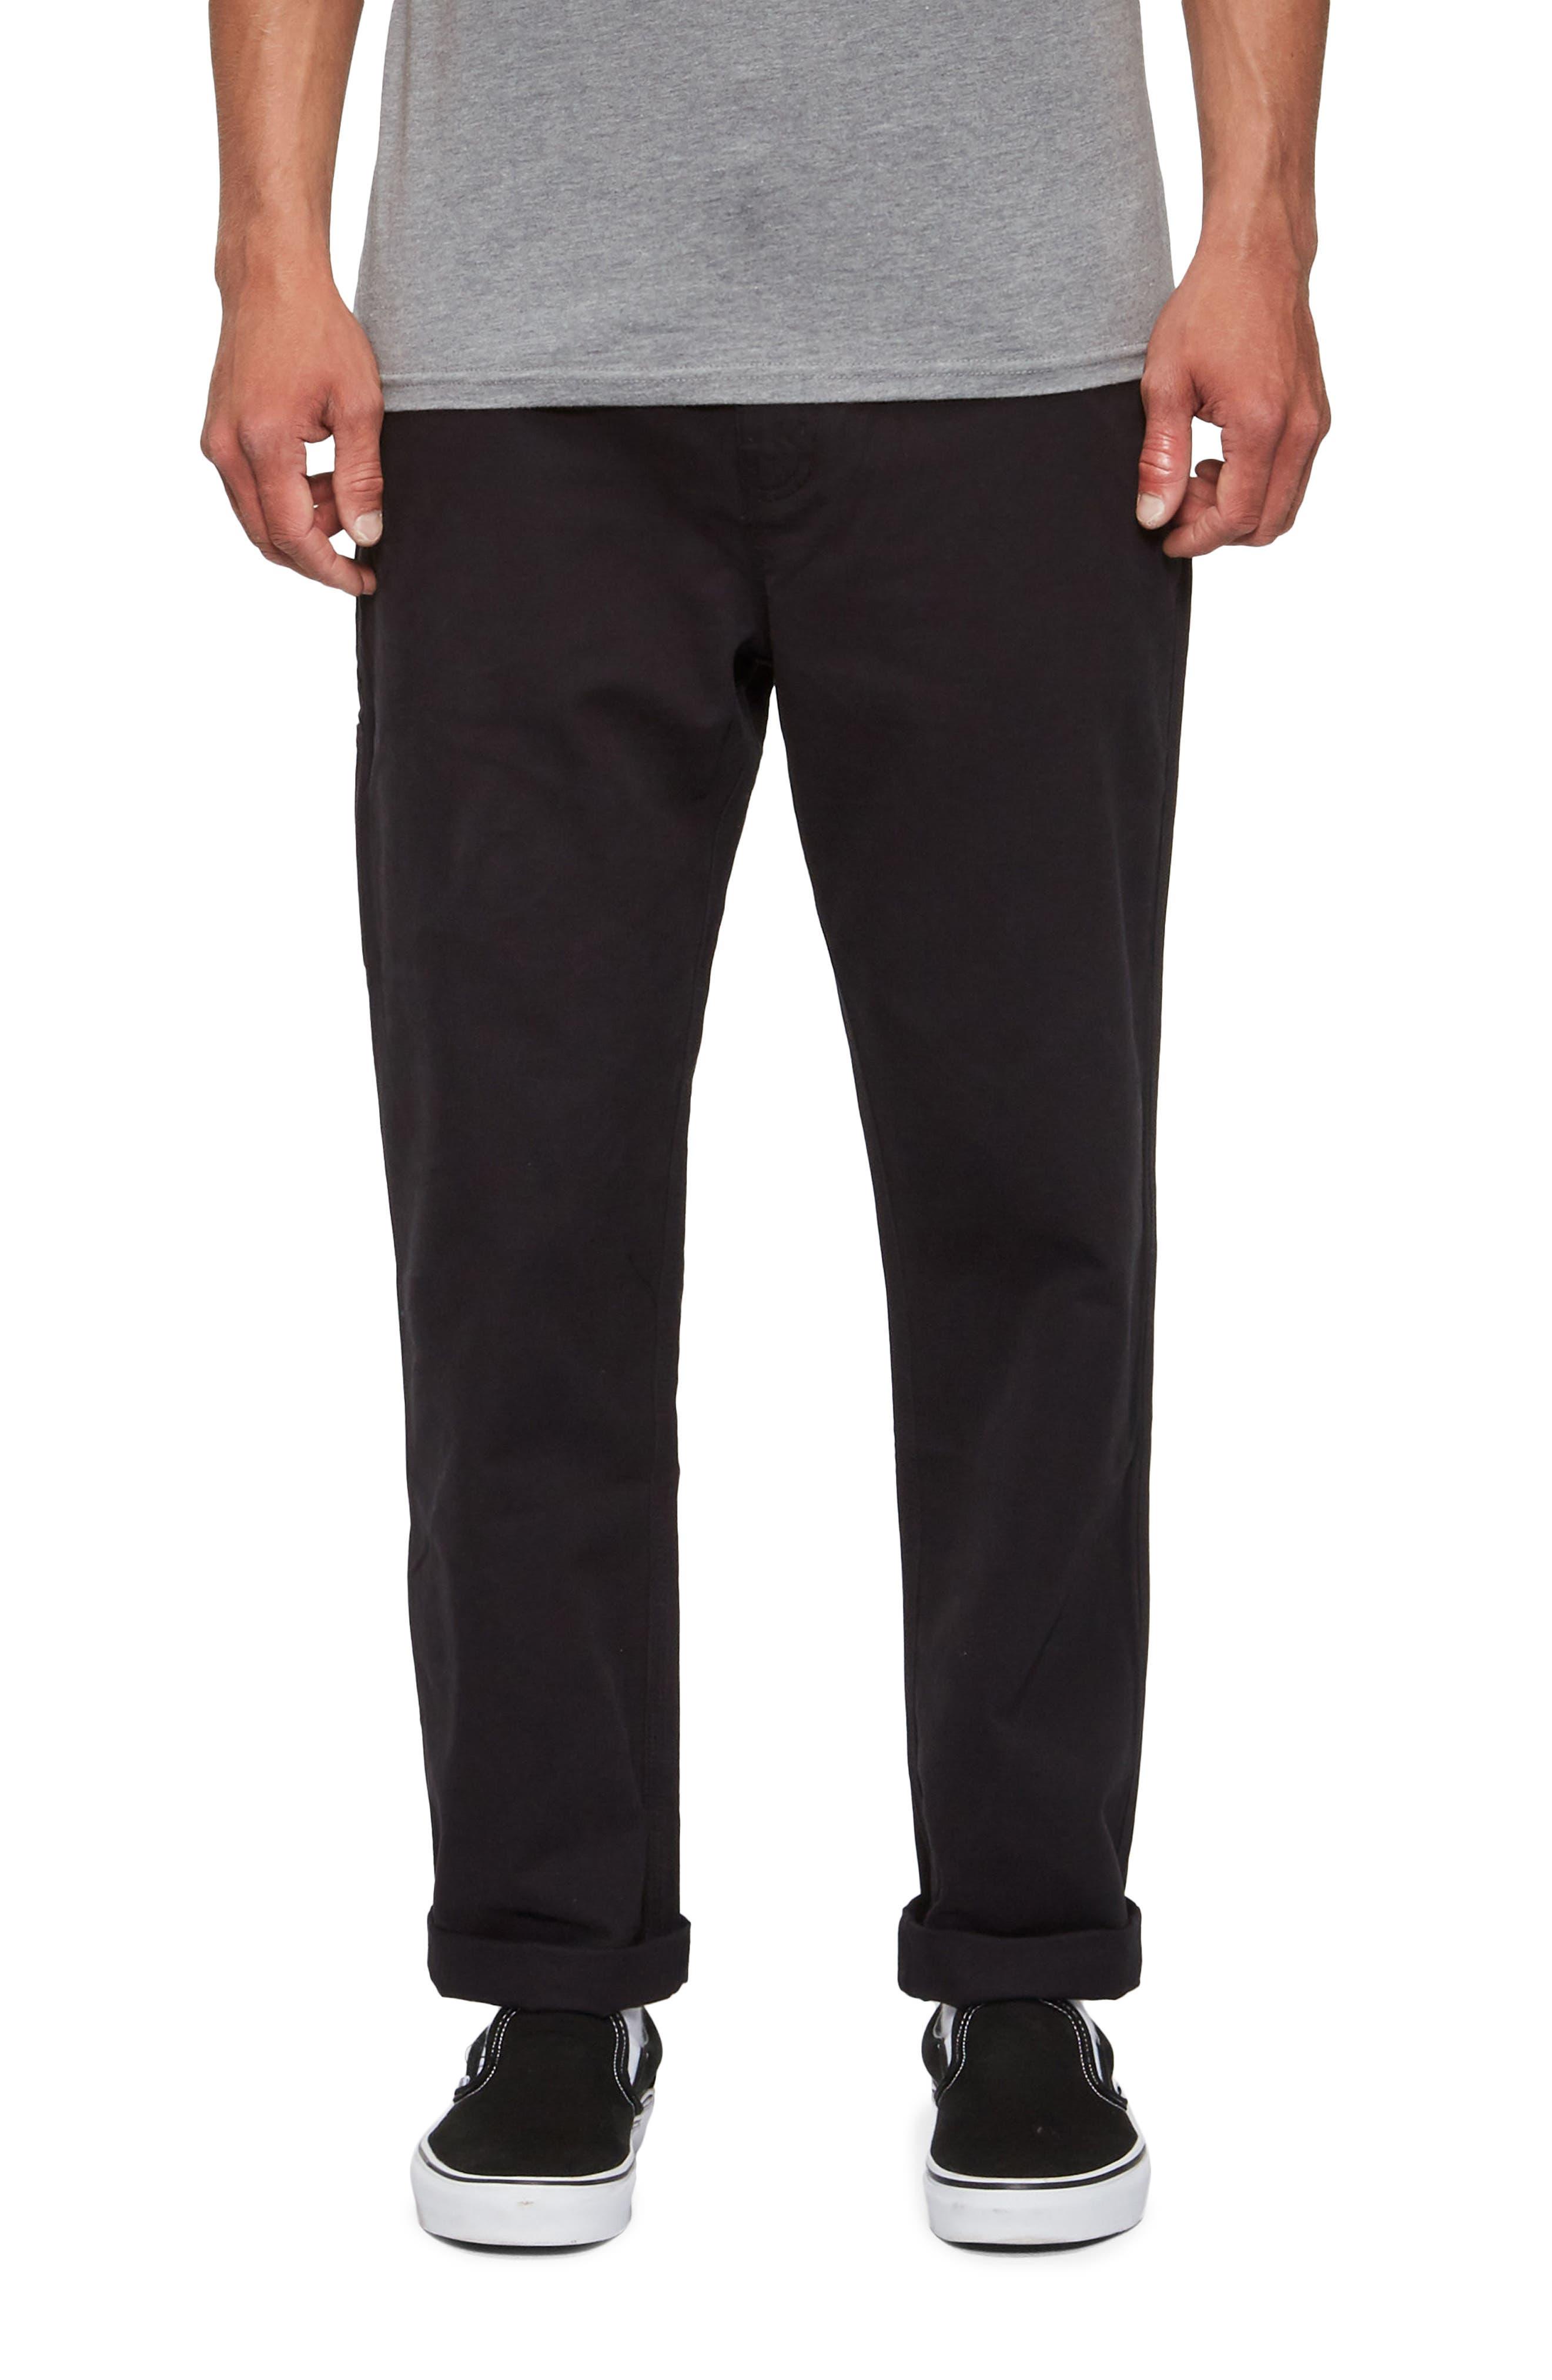 Westport Utility Pants,                         Main,                         color, 001